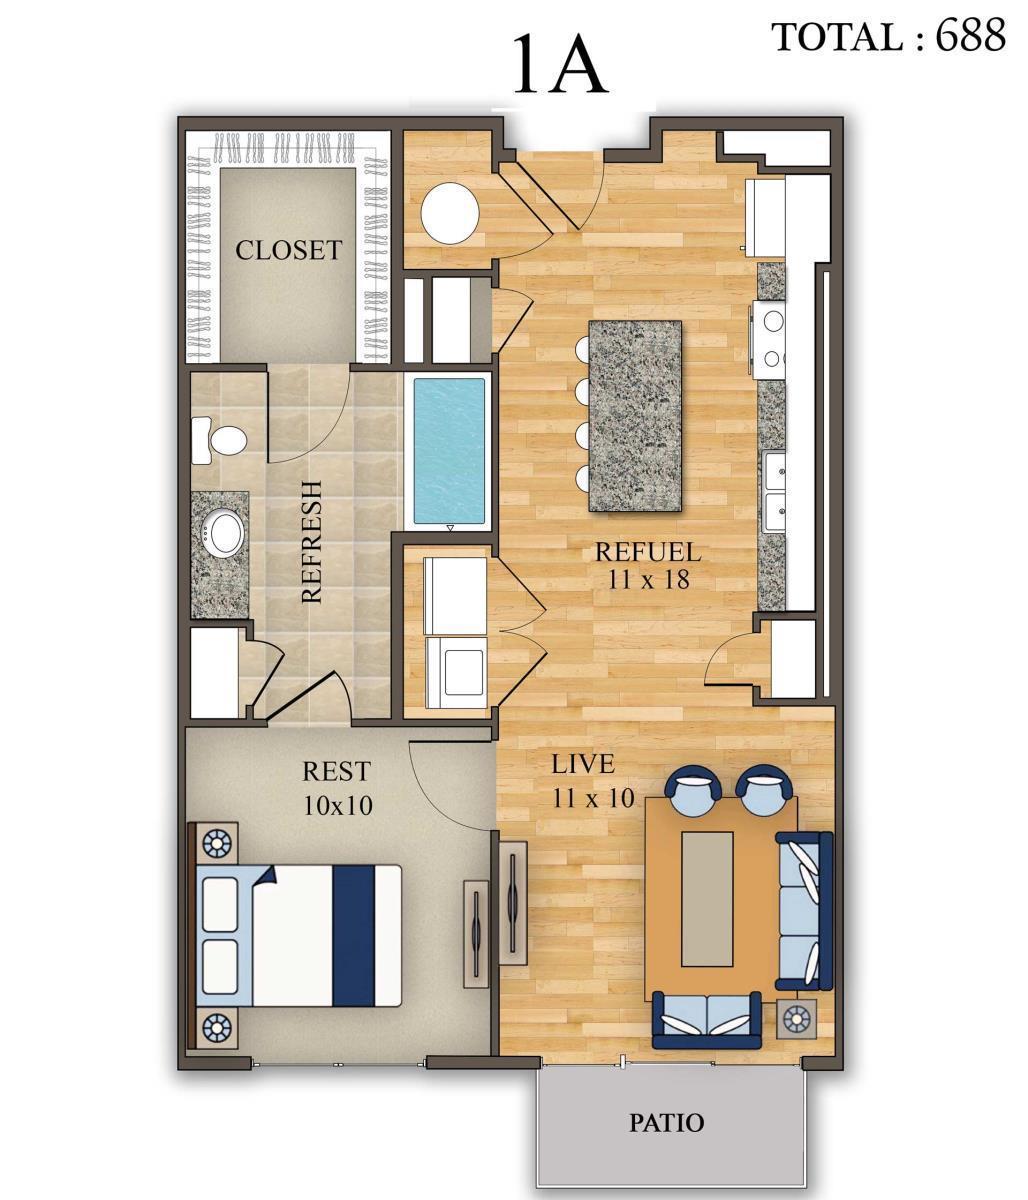 688 sq. ft. 1A floor plan